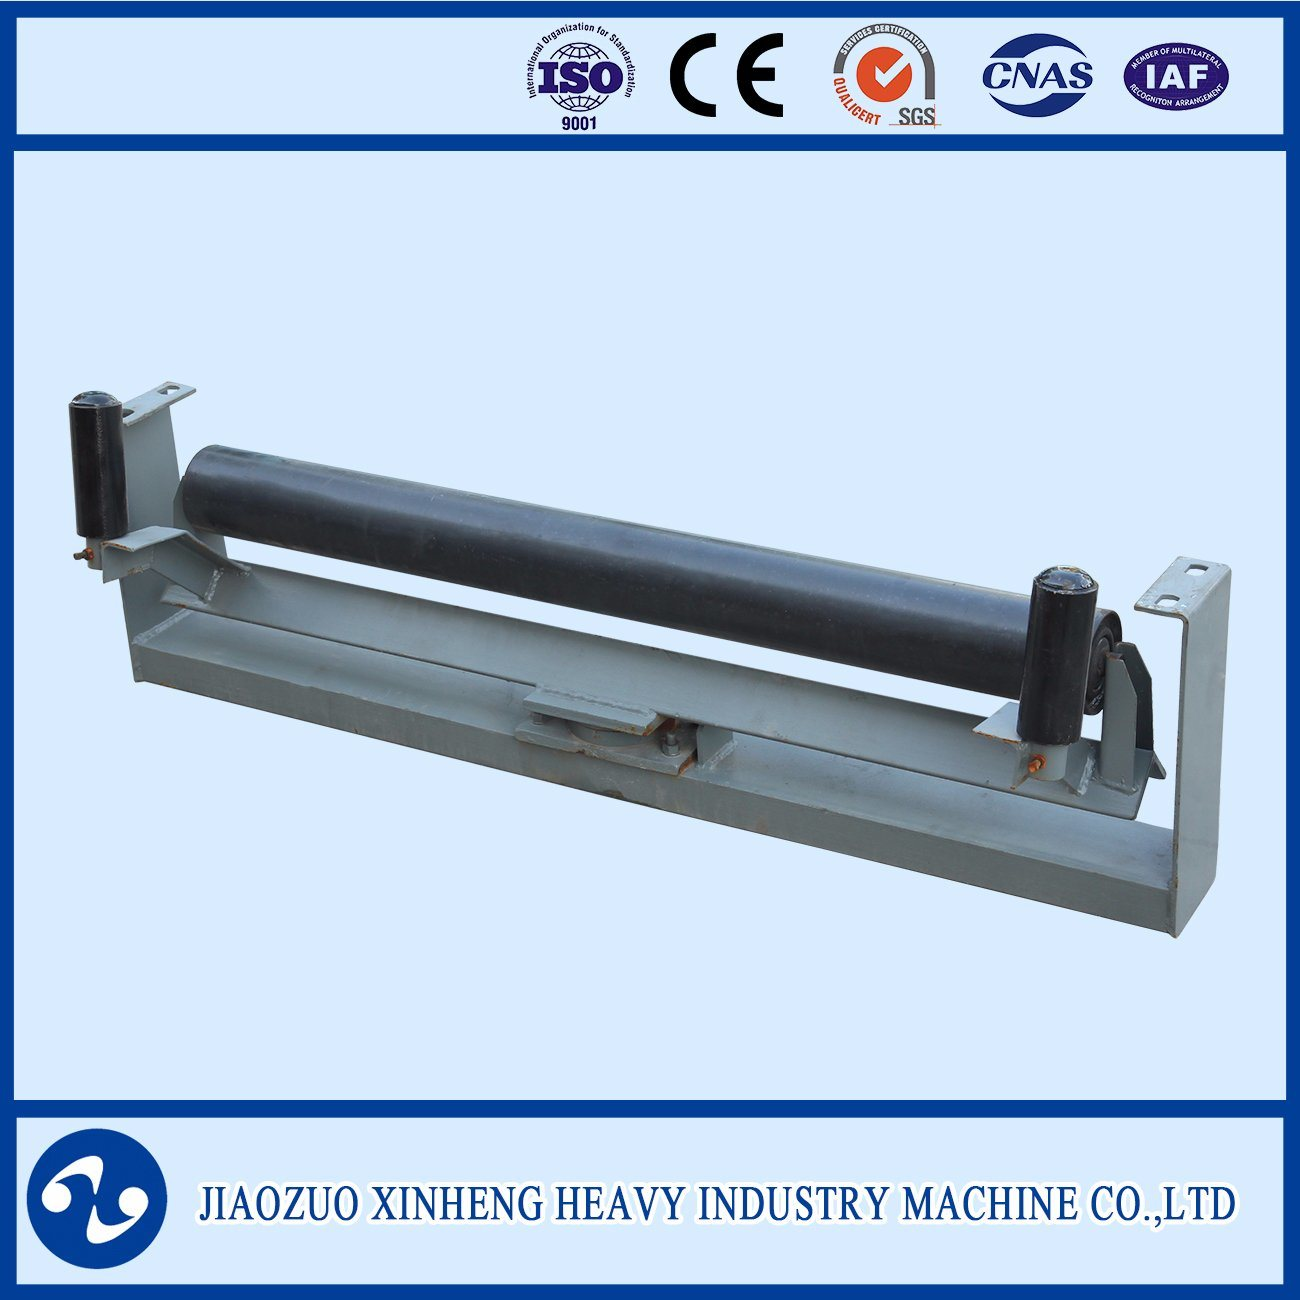 Trough Belt Conveyor Roller Group / Carrier Idler / Impact Roller